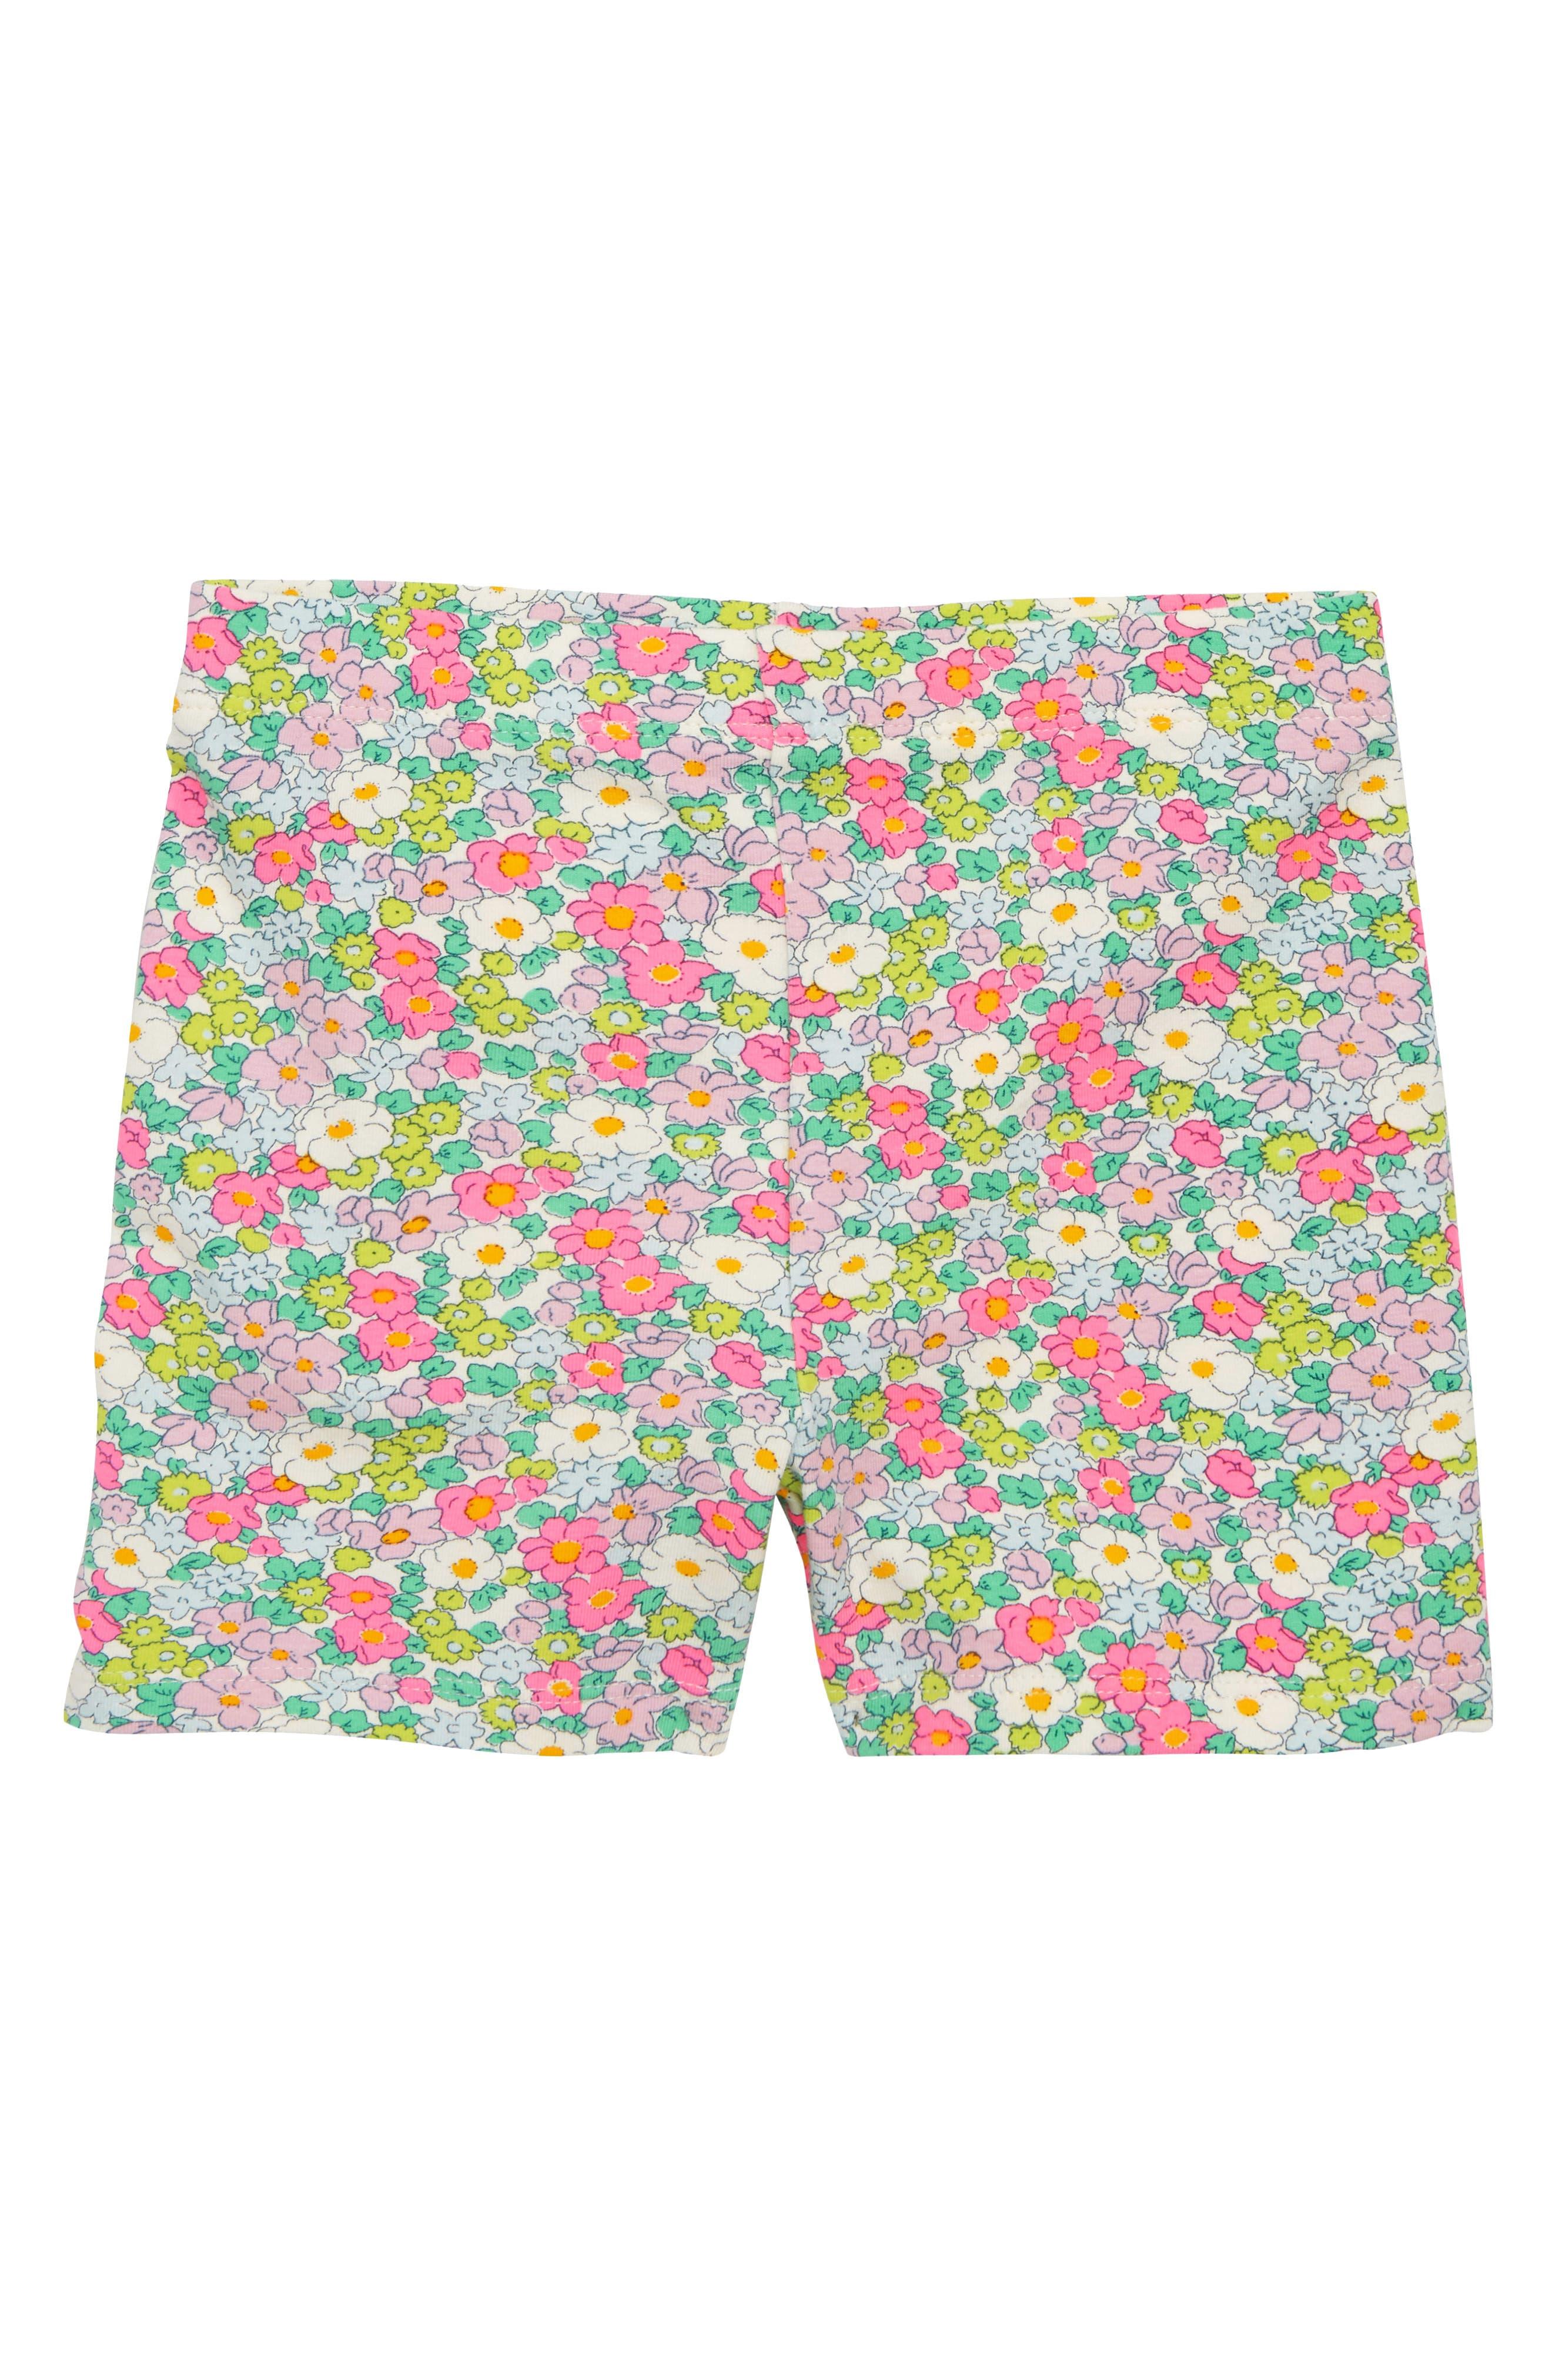 Jersey Shorts,                         Main,                         color, 656